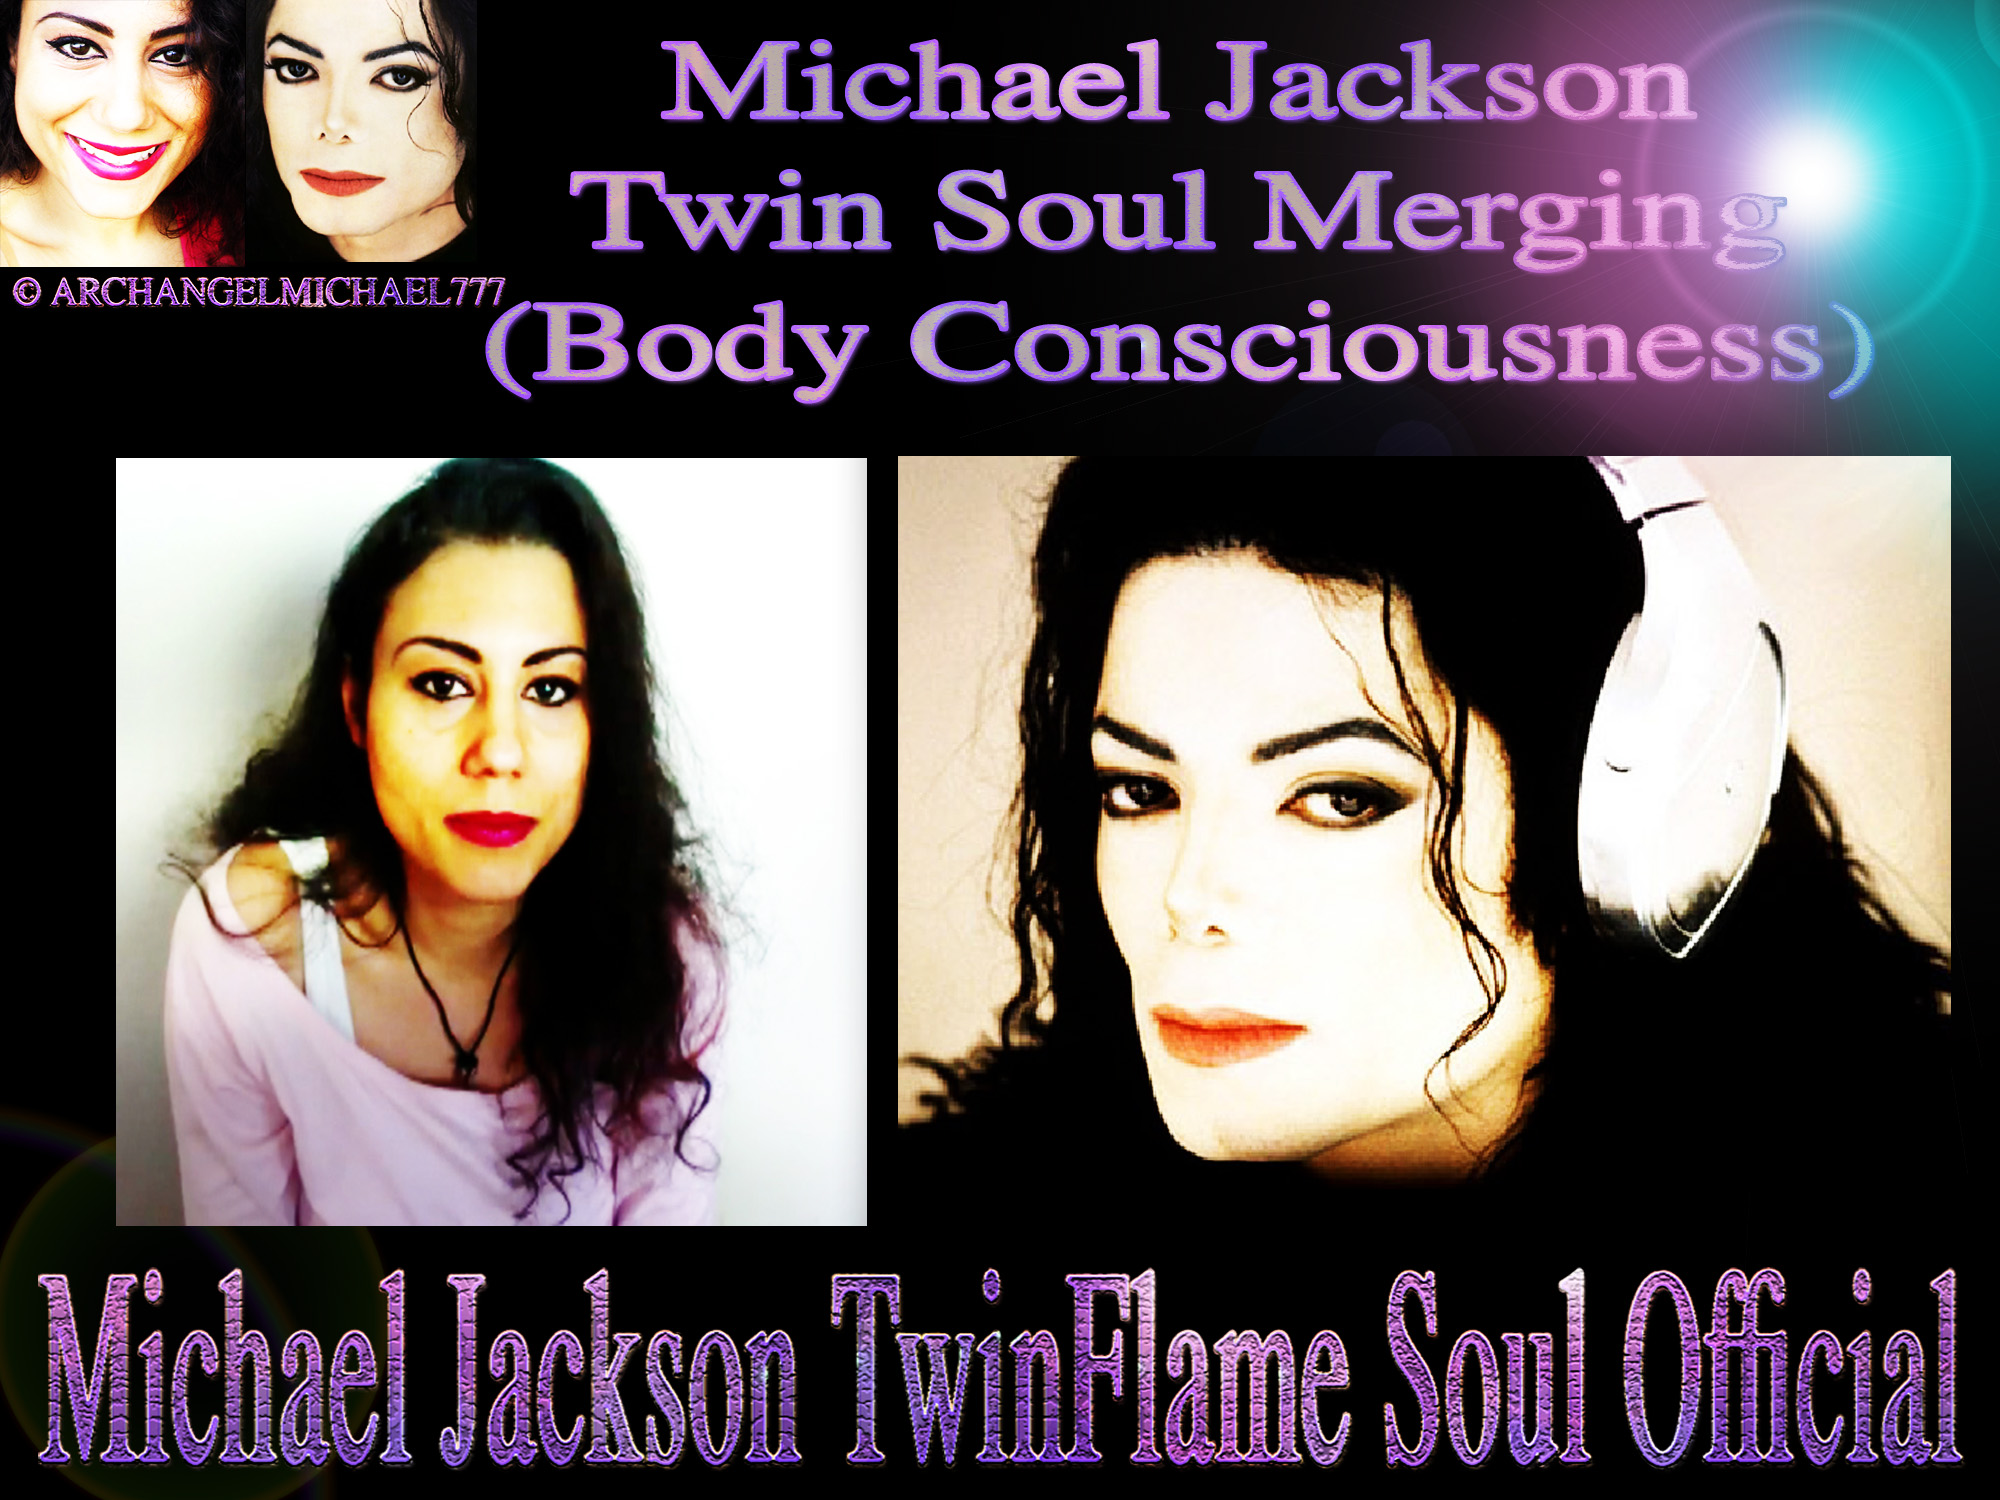 Cover Article Michael Jackson